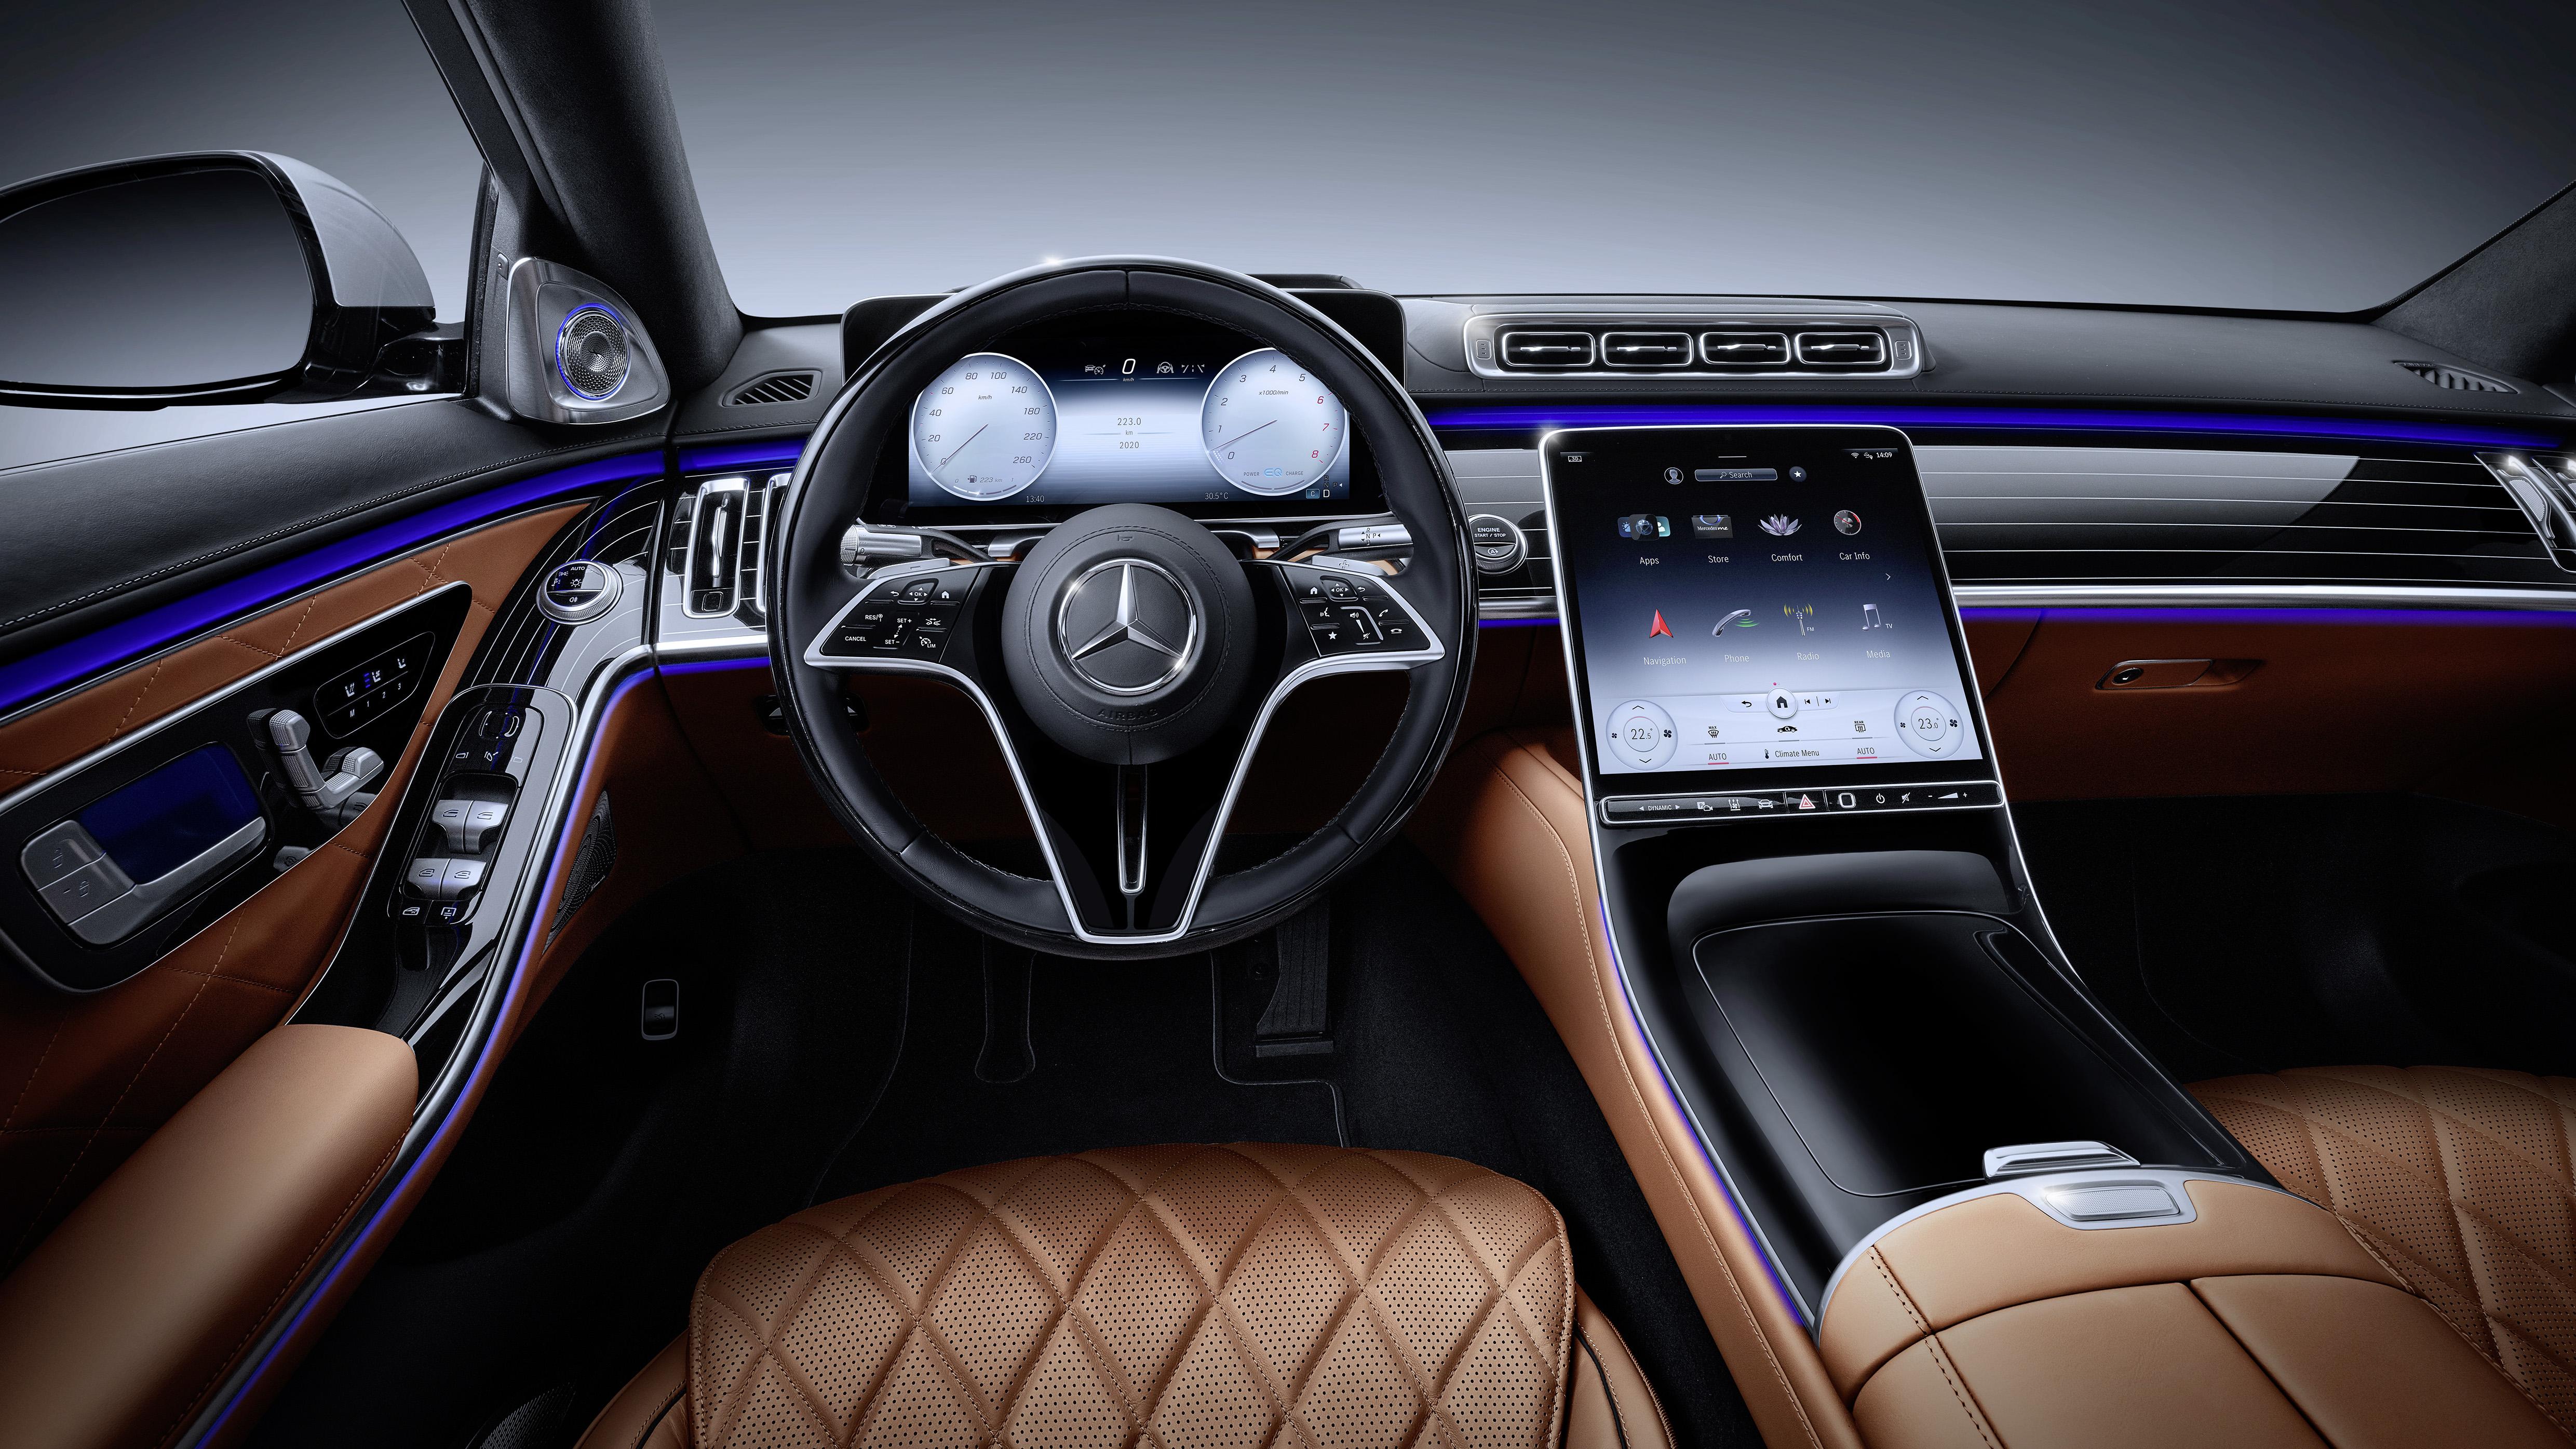 New-Gen Mercedes S-Class Features Level 3 Autonomy | WardsAuto